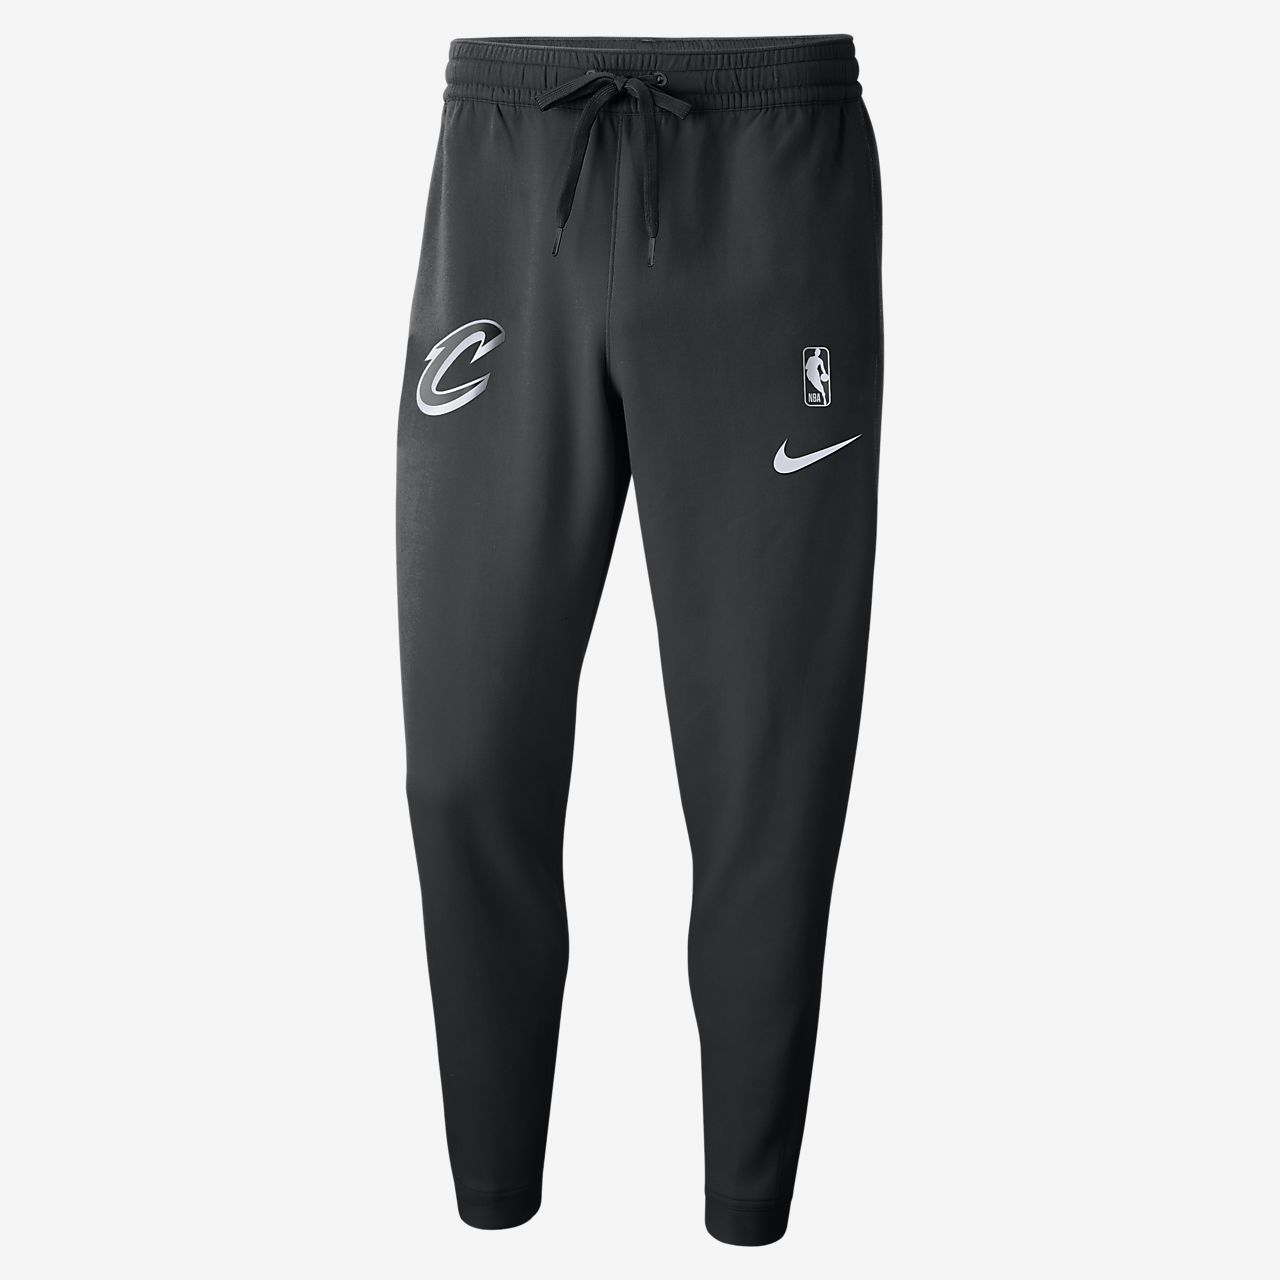 Cleveland Cavaliers Nike Dri-FIT Showtime Men's NBA Trousers